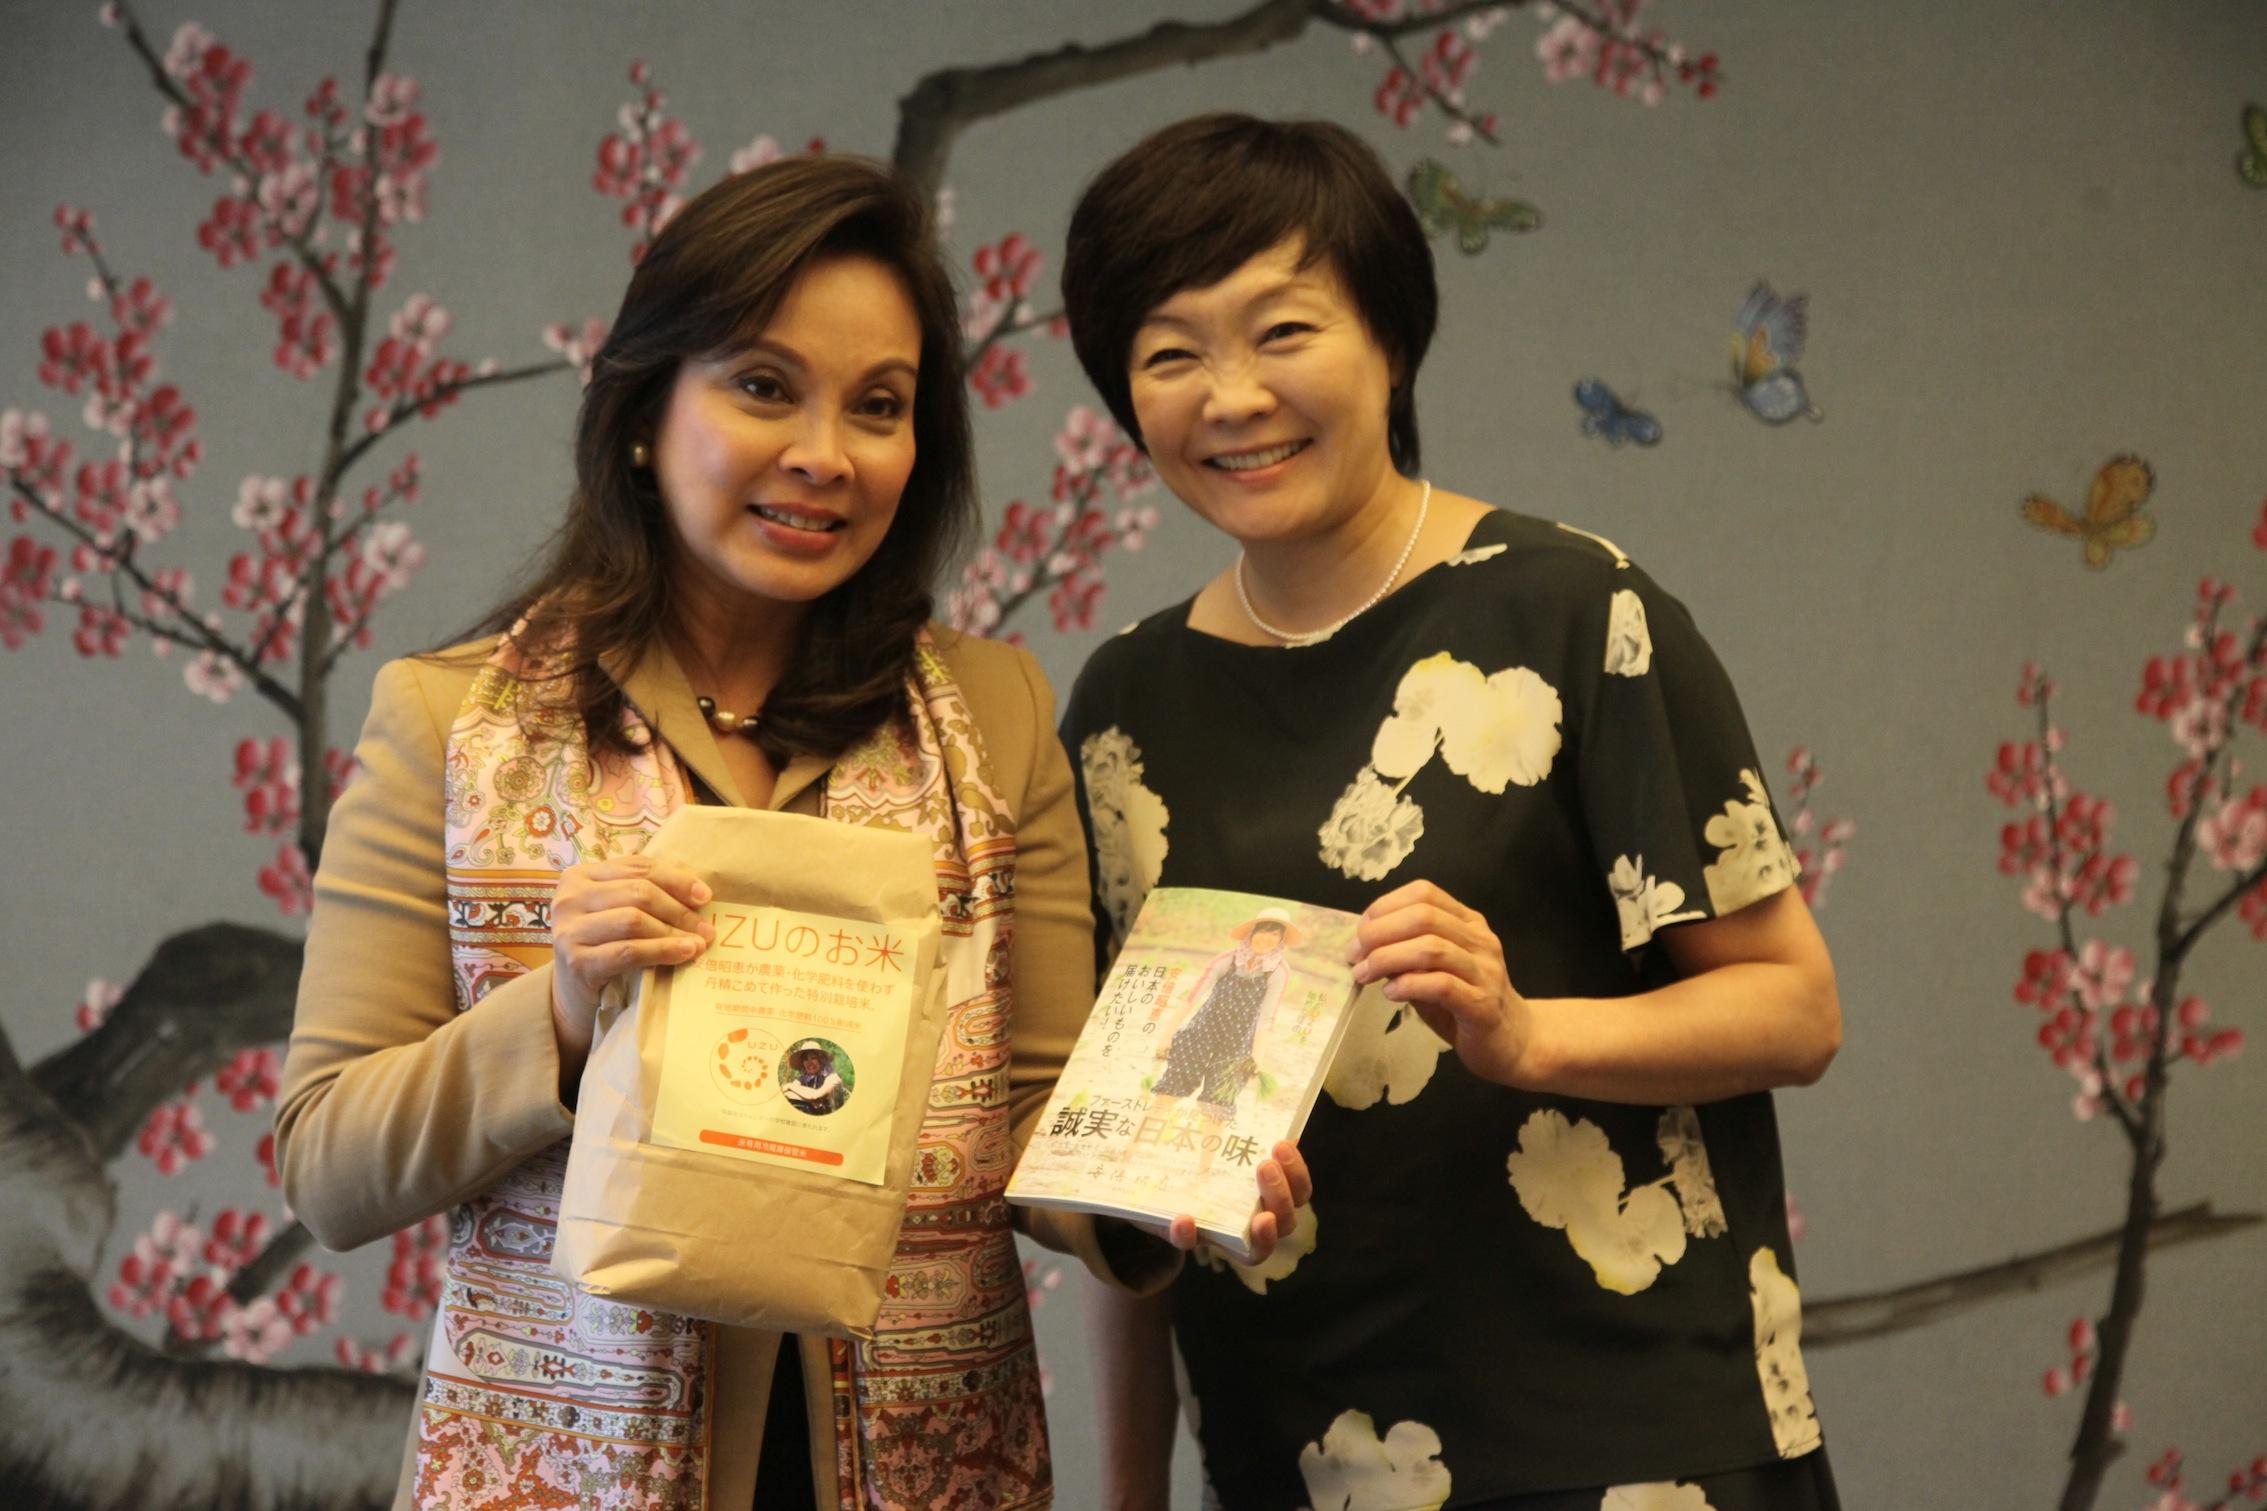 Sen. Legarda and Mrs. Abe at the APEC 2015 Forum